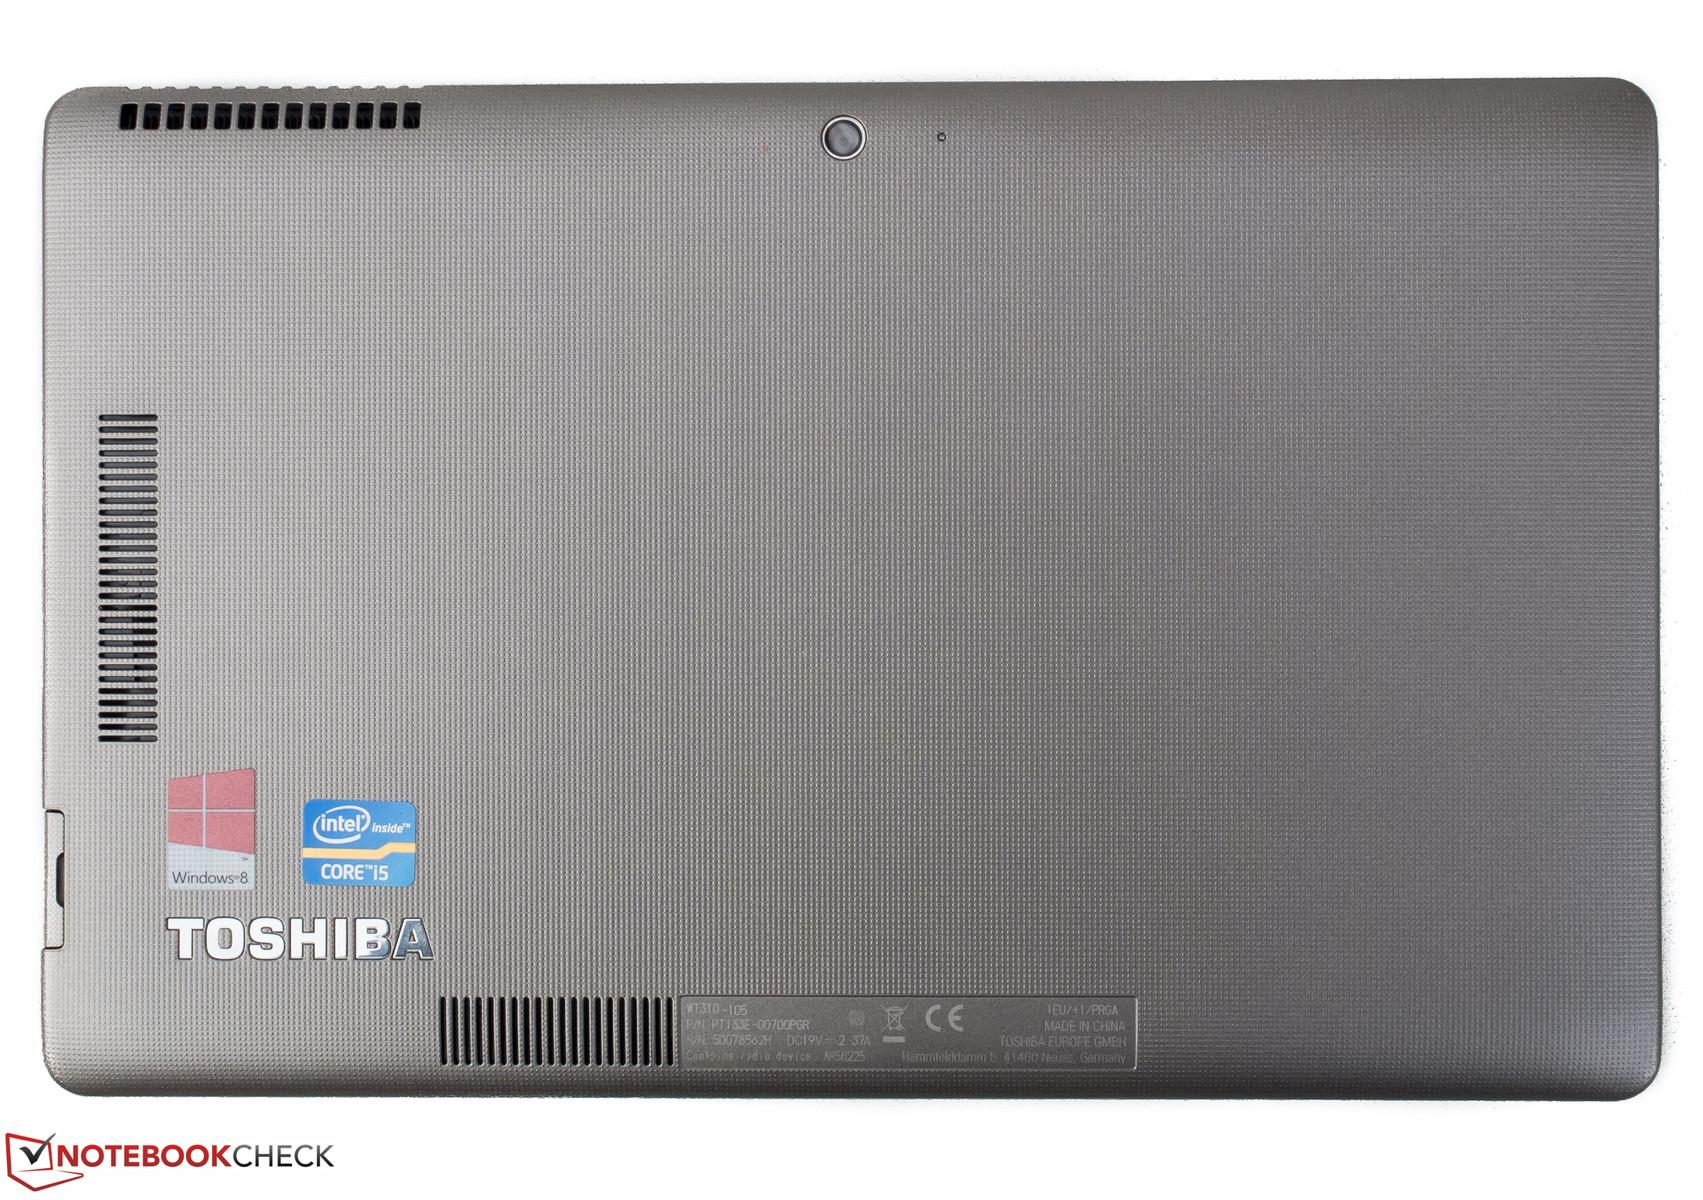 Toshiba WT310 Driver FREE